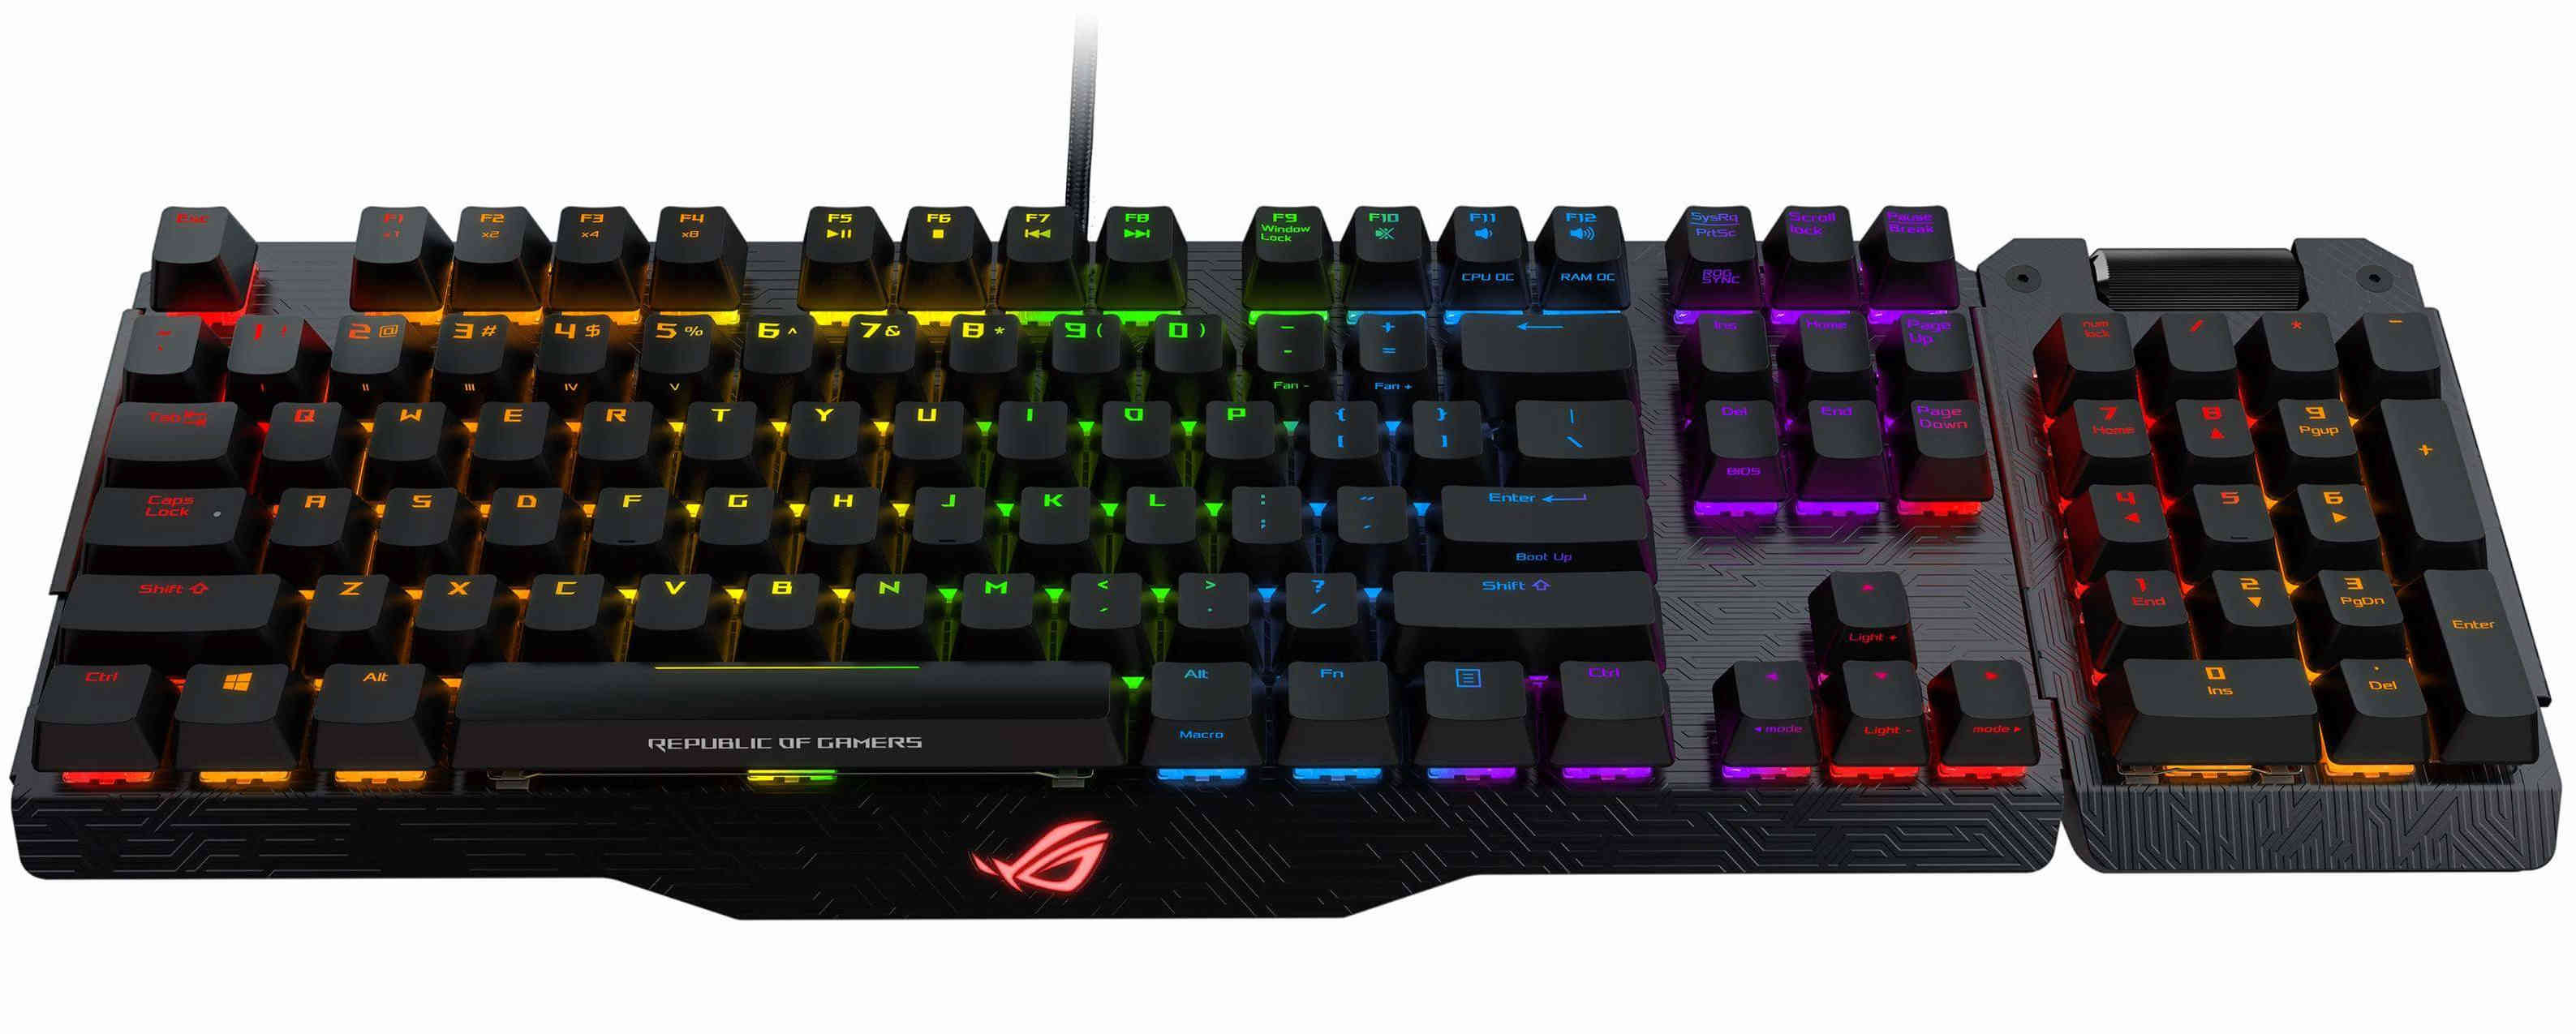 [Update] ASUS ROG Claymore Mechanical Gaming Keyboard 52b10